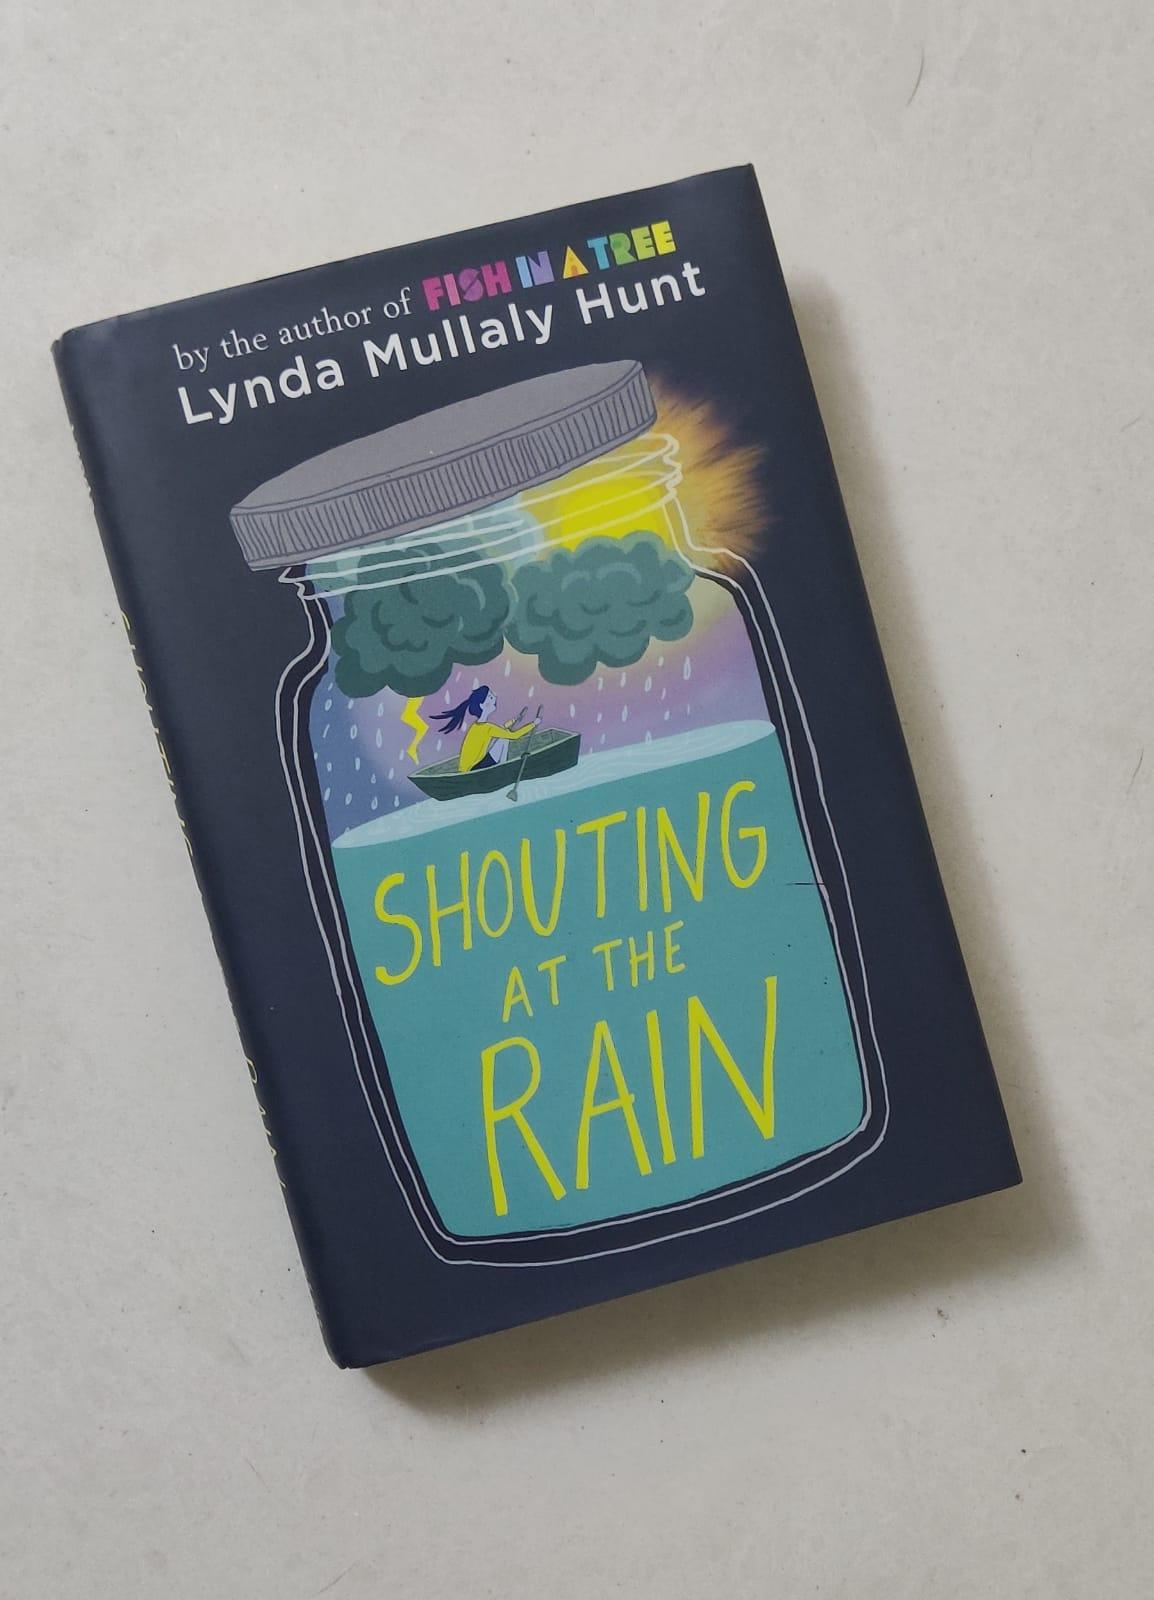 Review: Shouting At The Rain